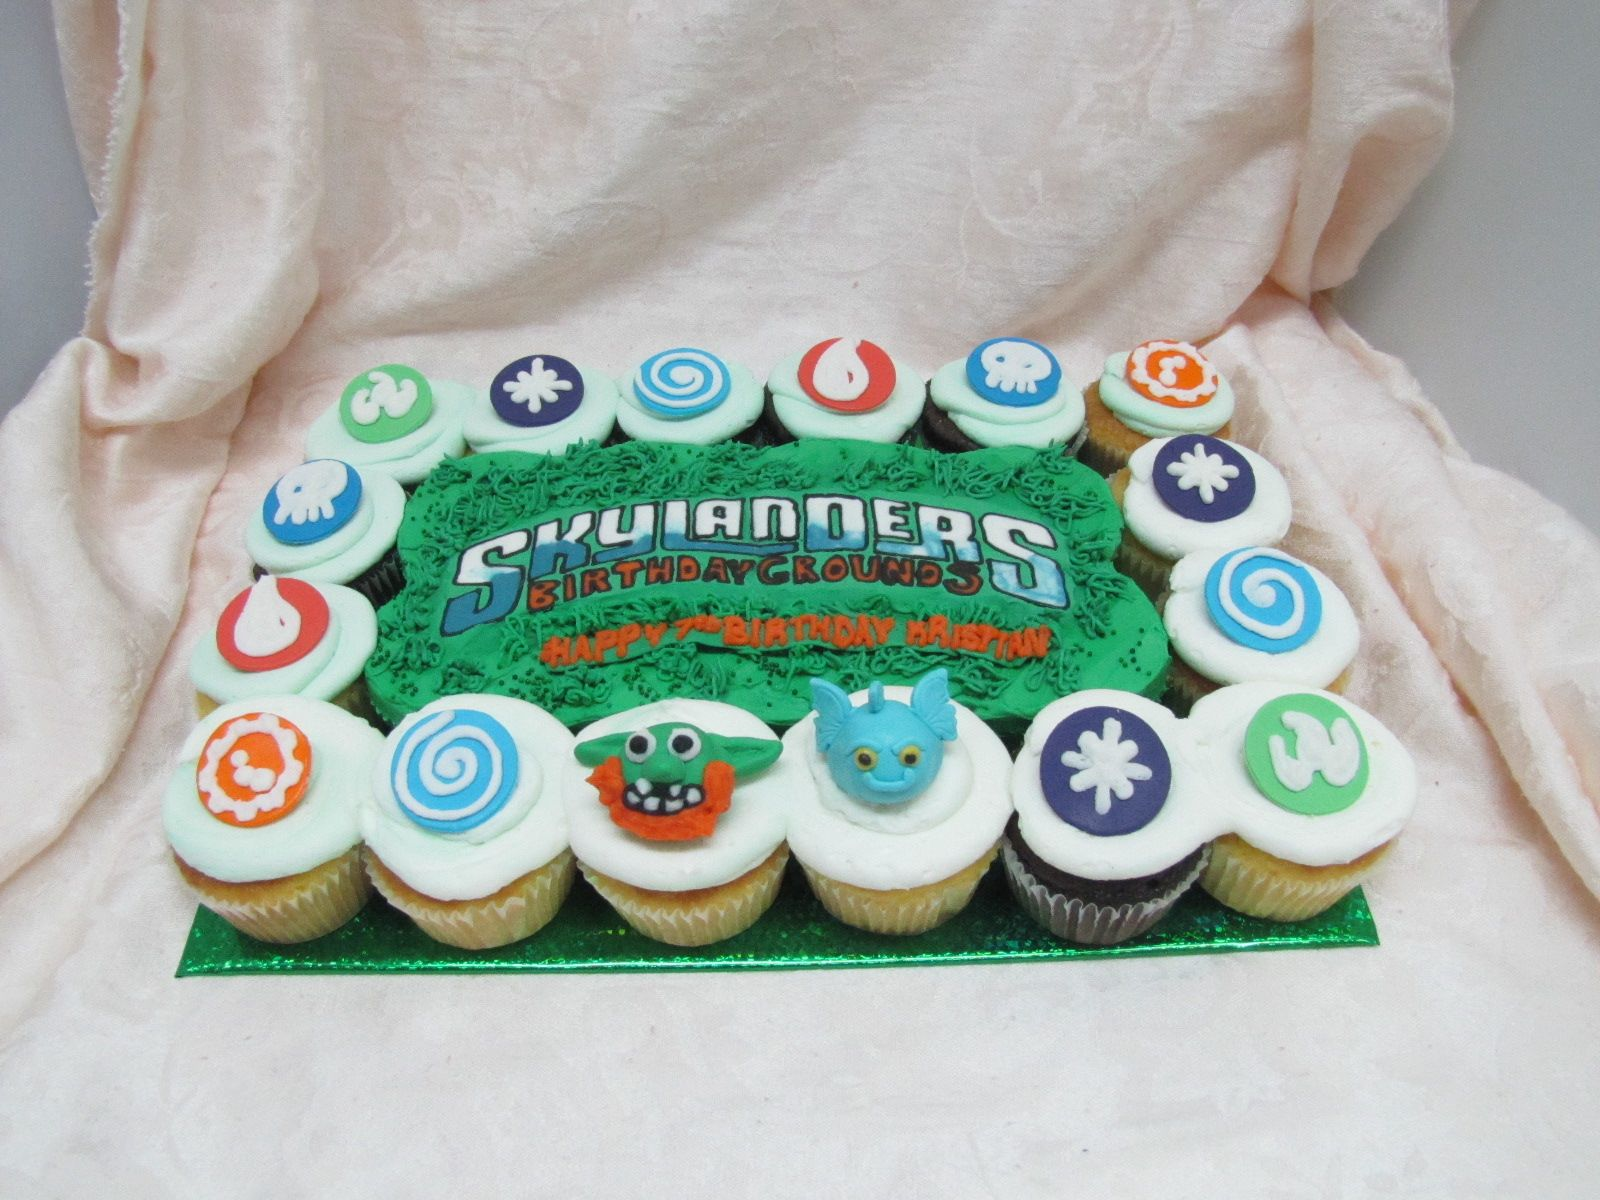 SkyLanders Cupcake Cake Dessert First LLC 71626CAKES Dessert